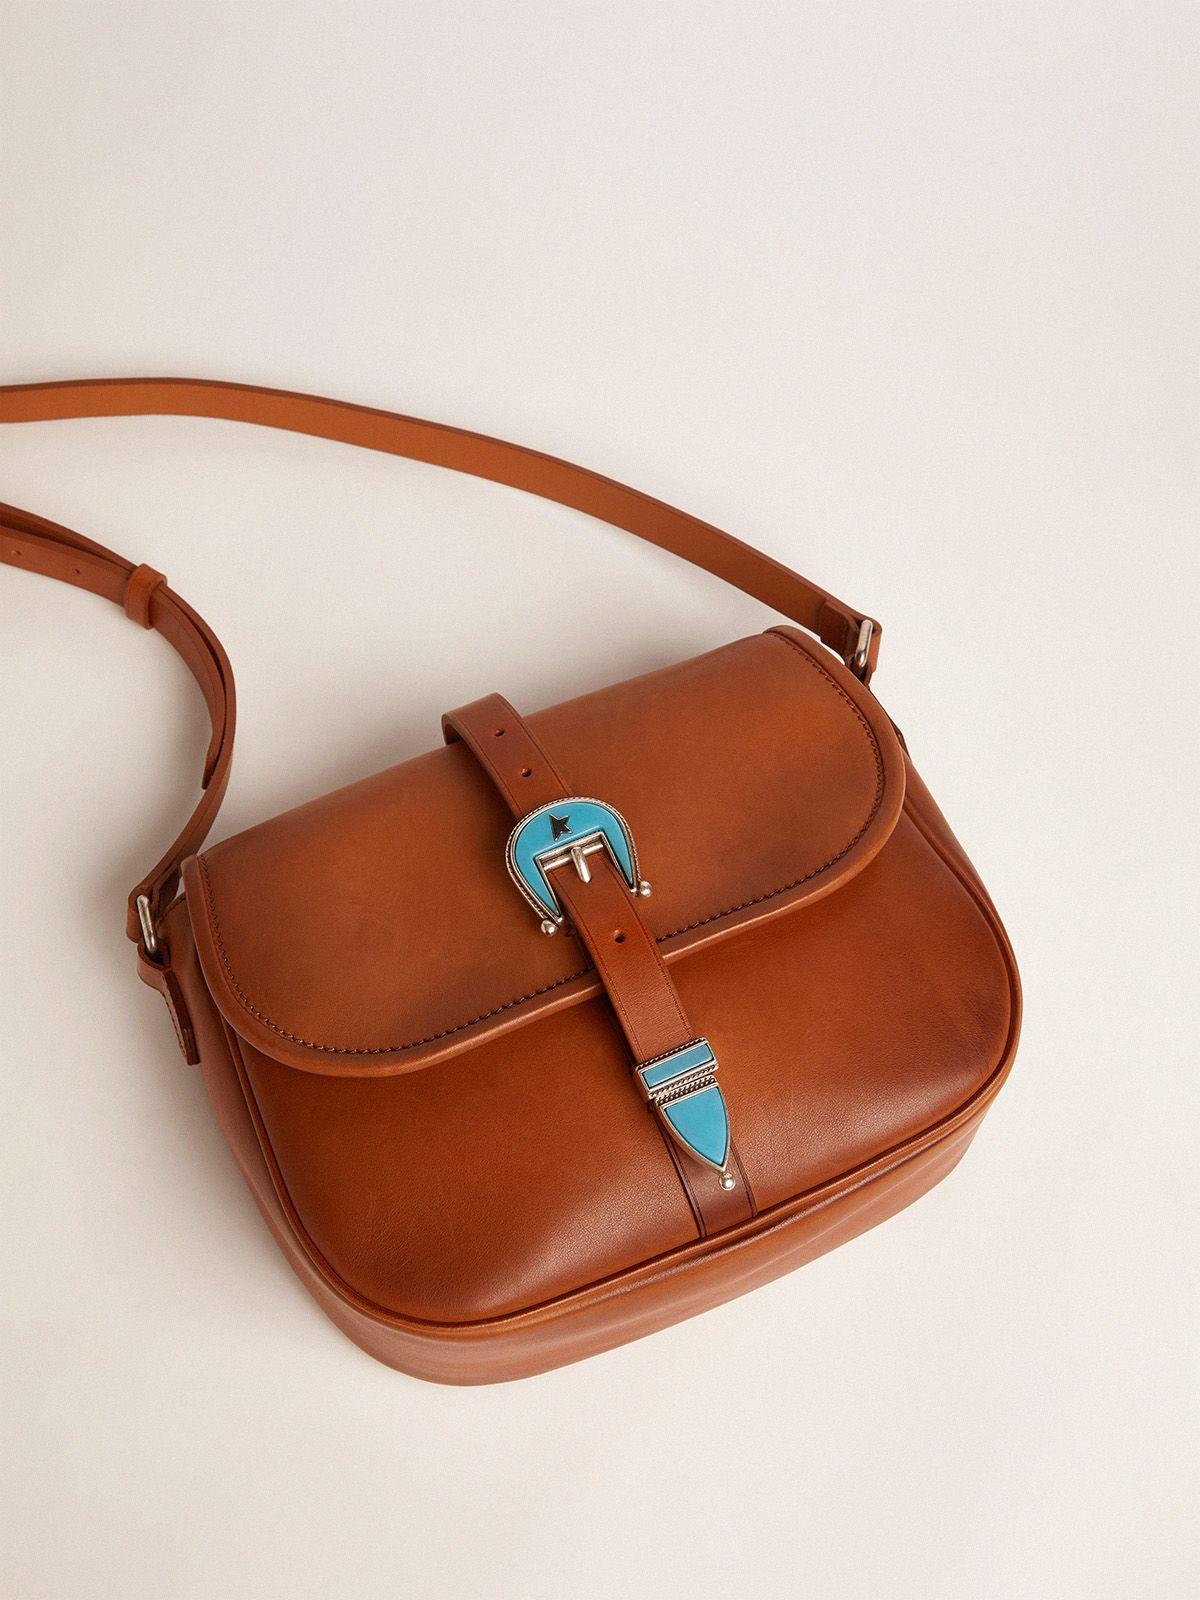 Golden Goose - Borsa Rodeo Bag medium in pelle cuoio chiaro con fibbia azzurra   in